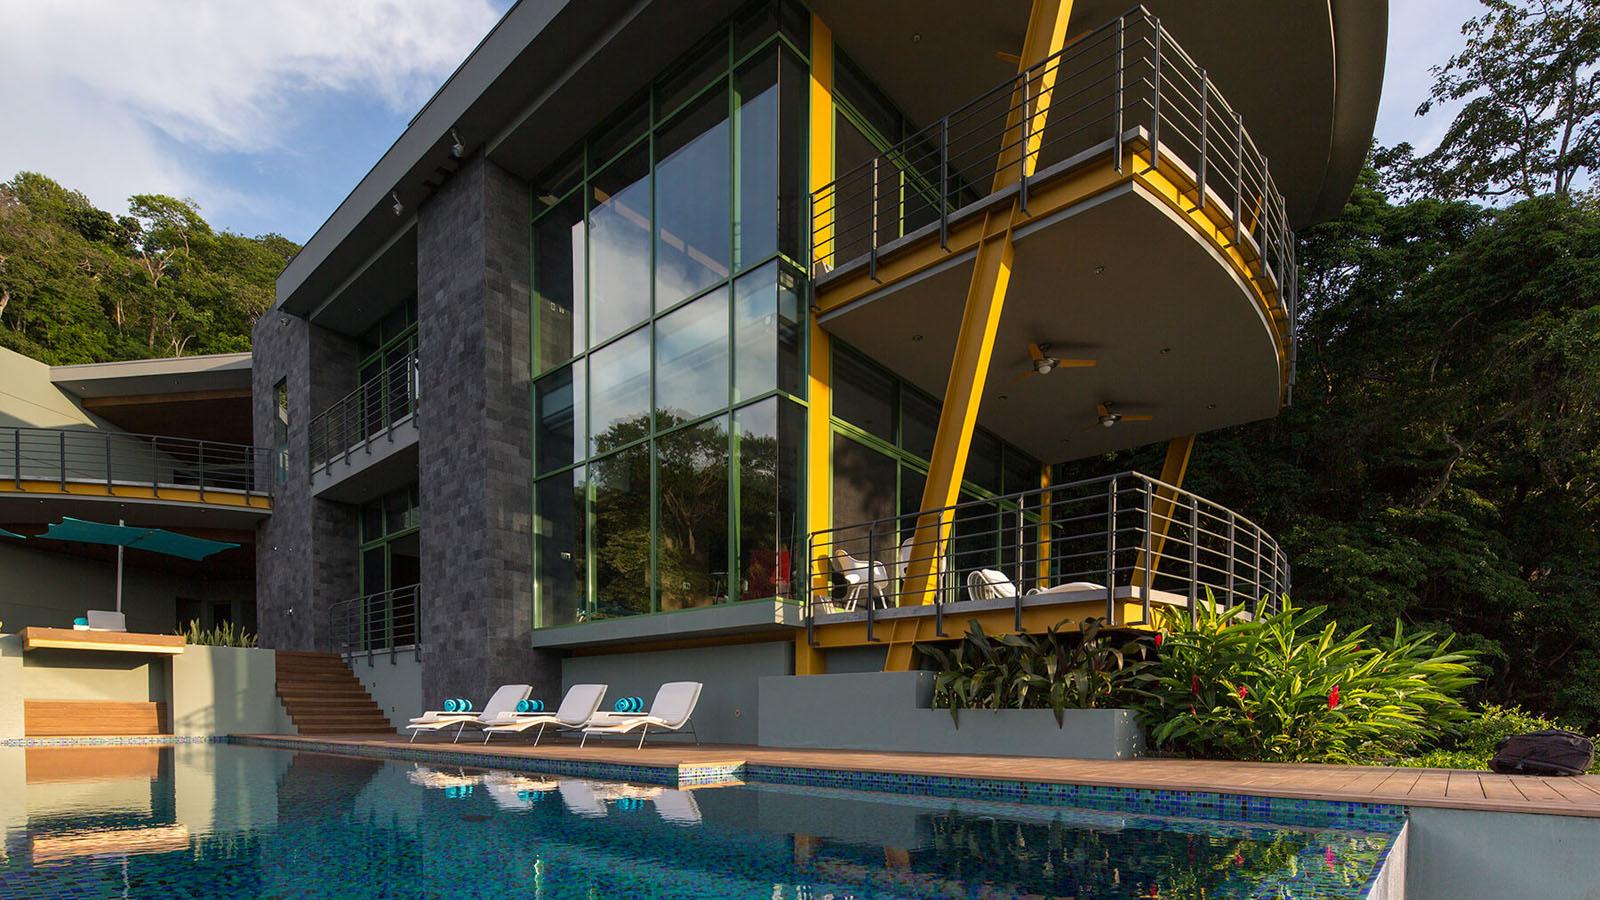 Best Kitchen Gallery: Tropical Modern House Costa Rica 8 Idesignarch Interior Design of Tropical Modern House on rachelxblog.com